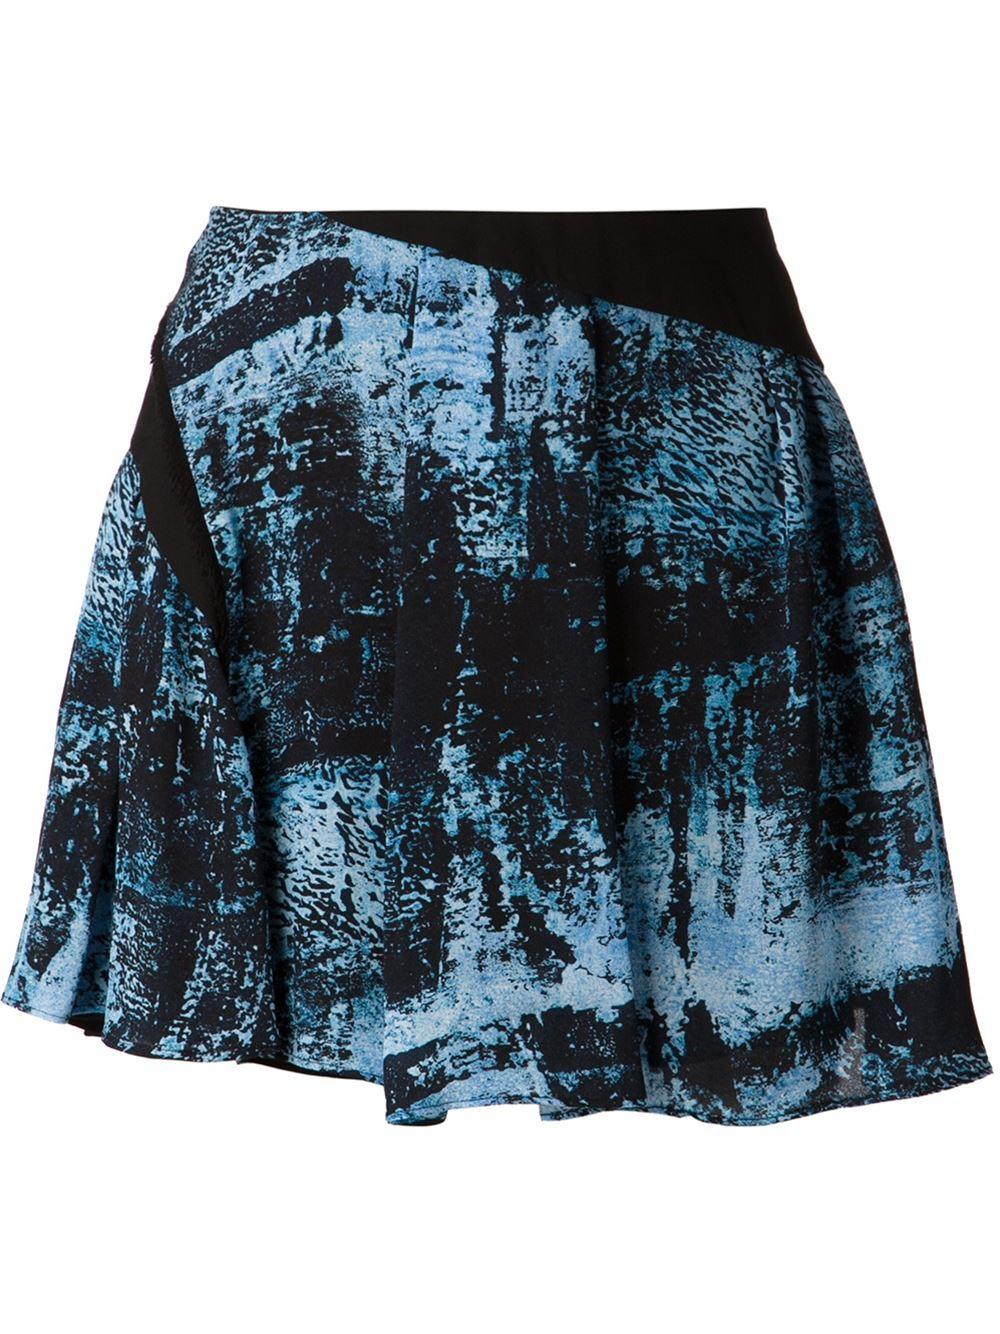 proenza schouler blotchy print skirt in blue lyst